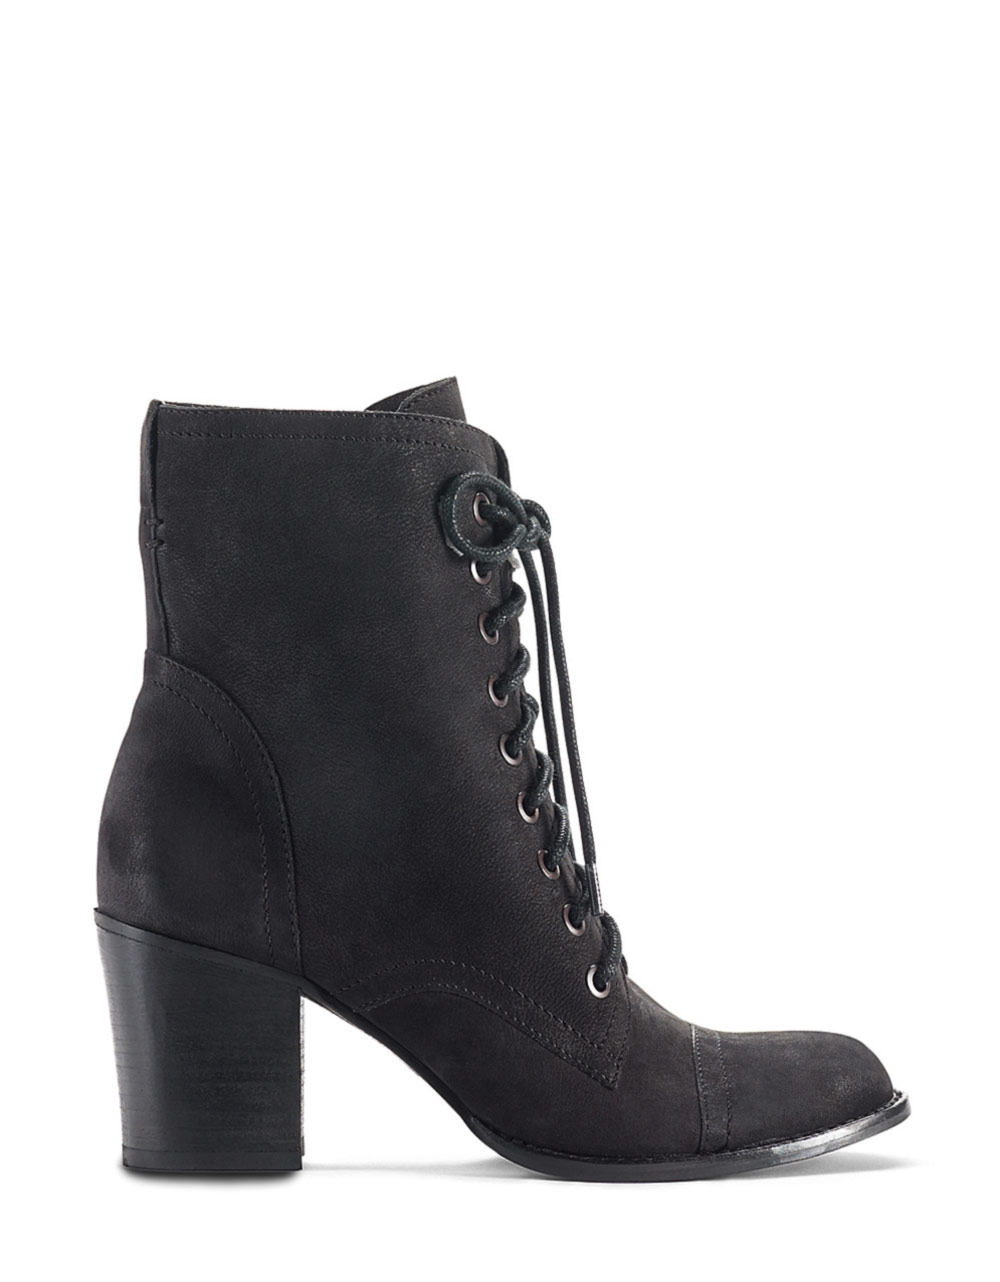 vince camuto vestas high heel leather boots in black